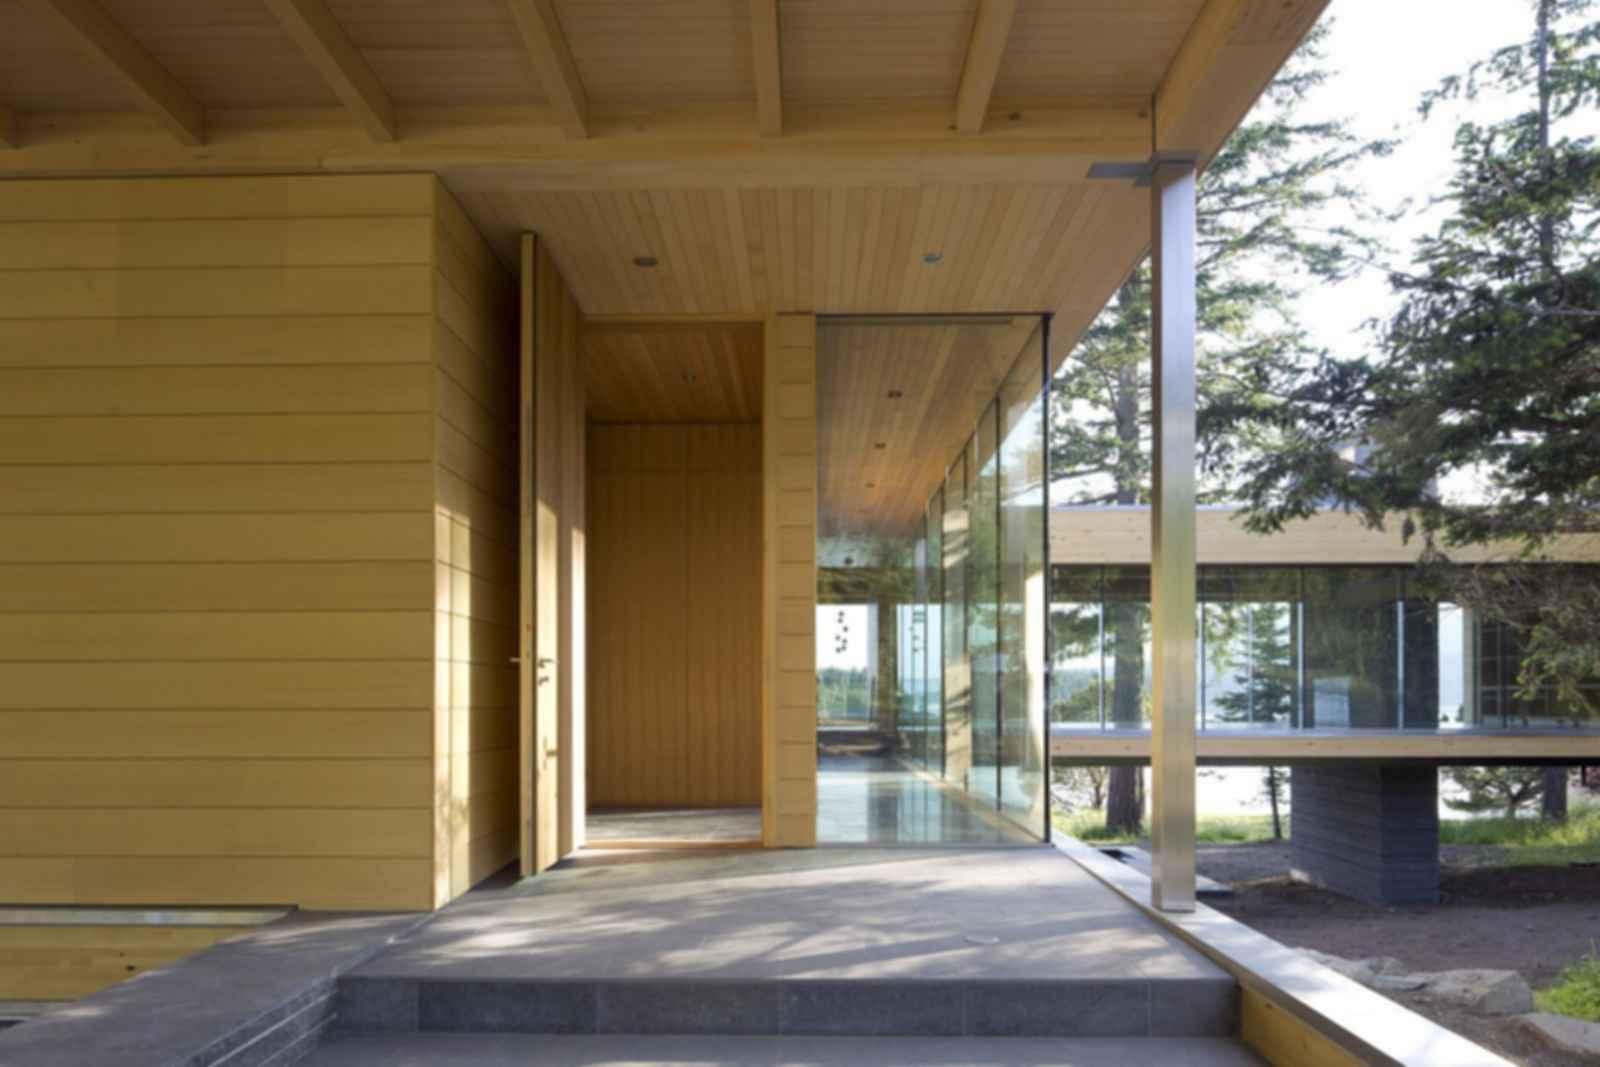 Gulf Islands Residence - Exterior/Entrance